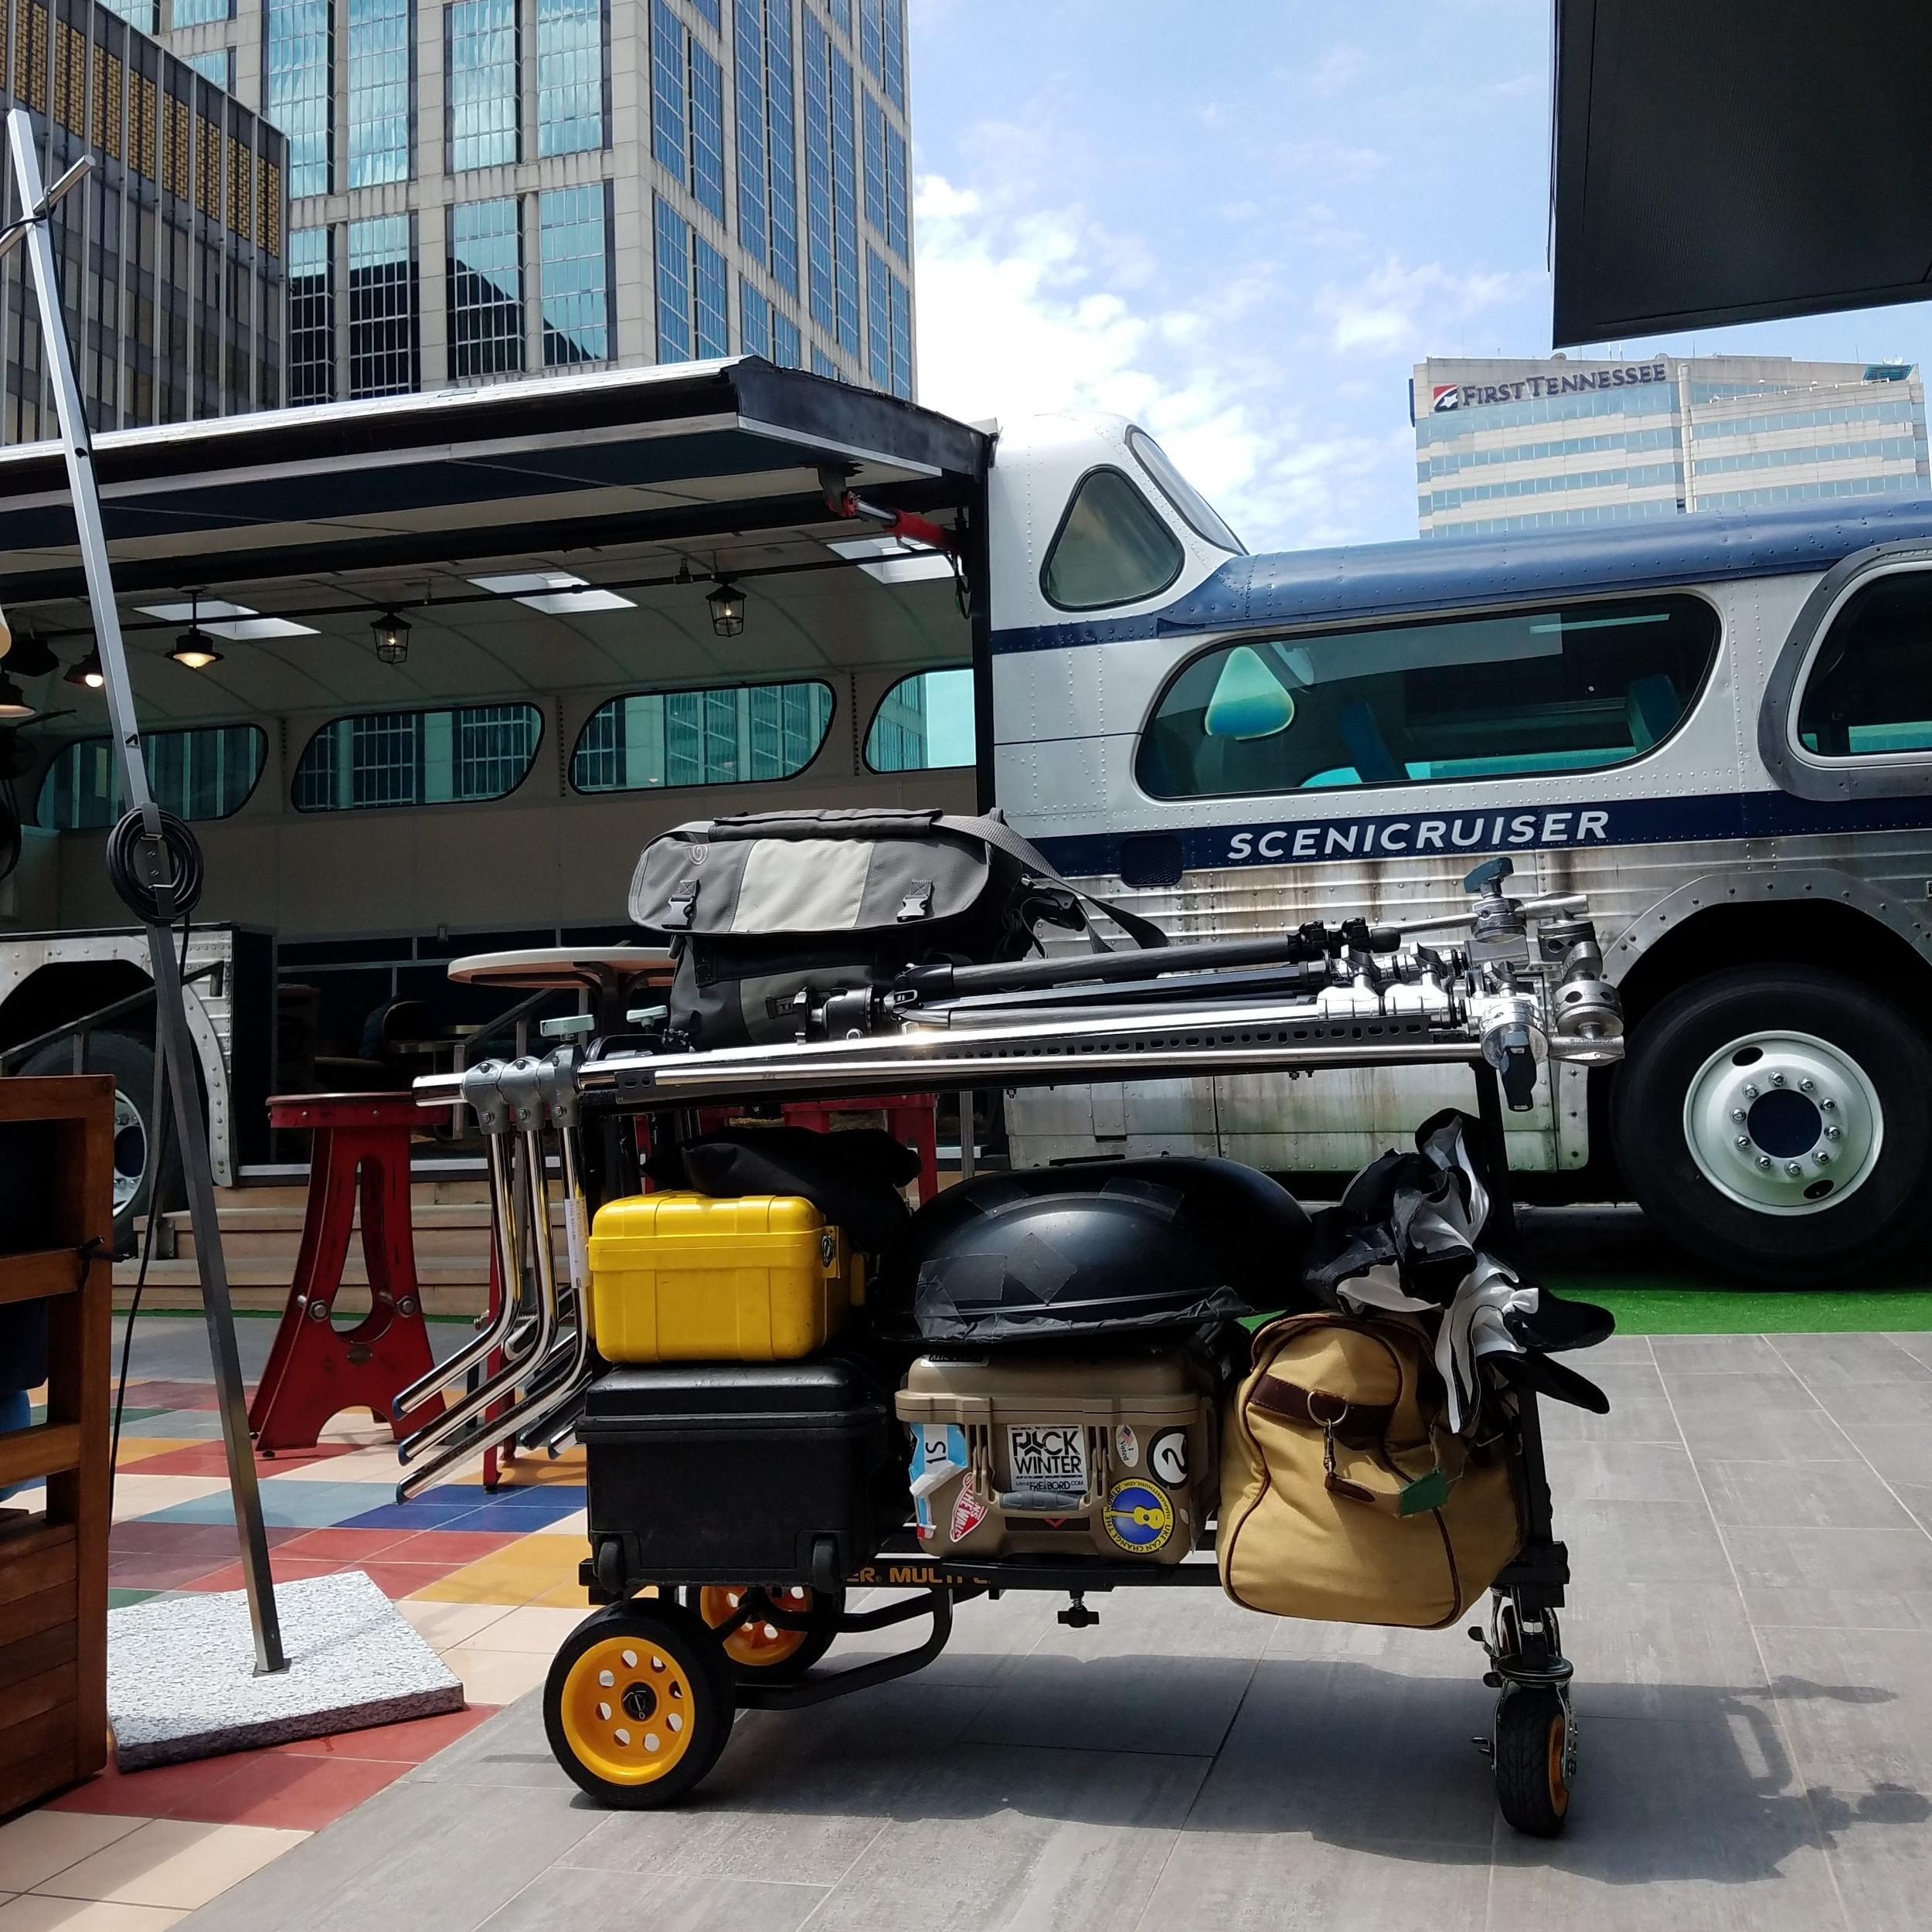 My Multi Cart R6G on location in Nashville, TN.